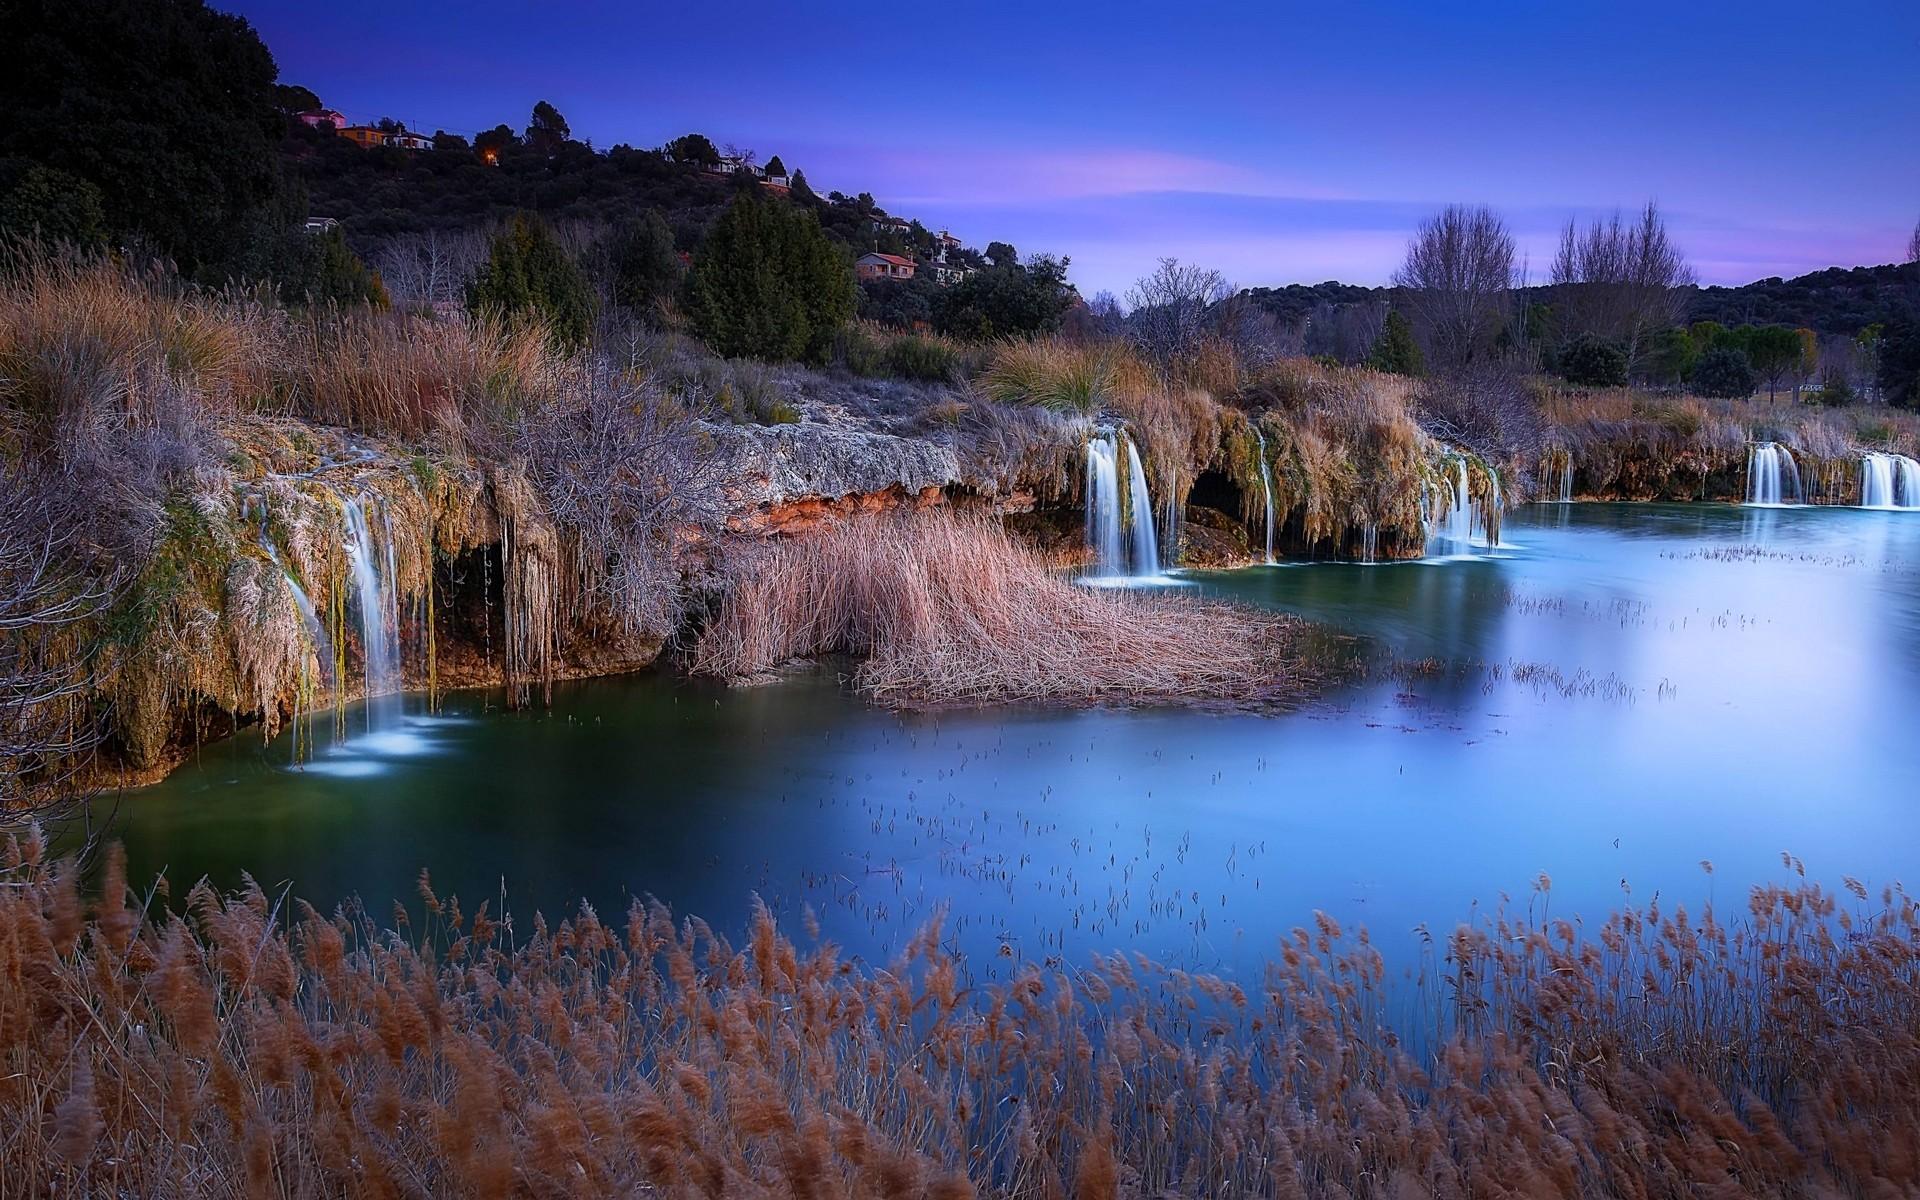 углу природа реки испании фото раздавить гада первого